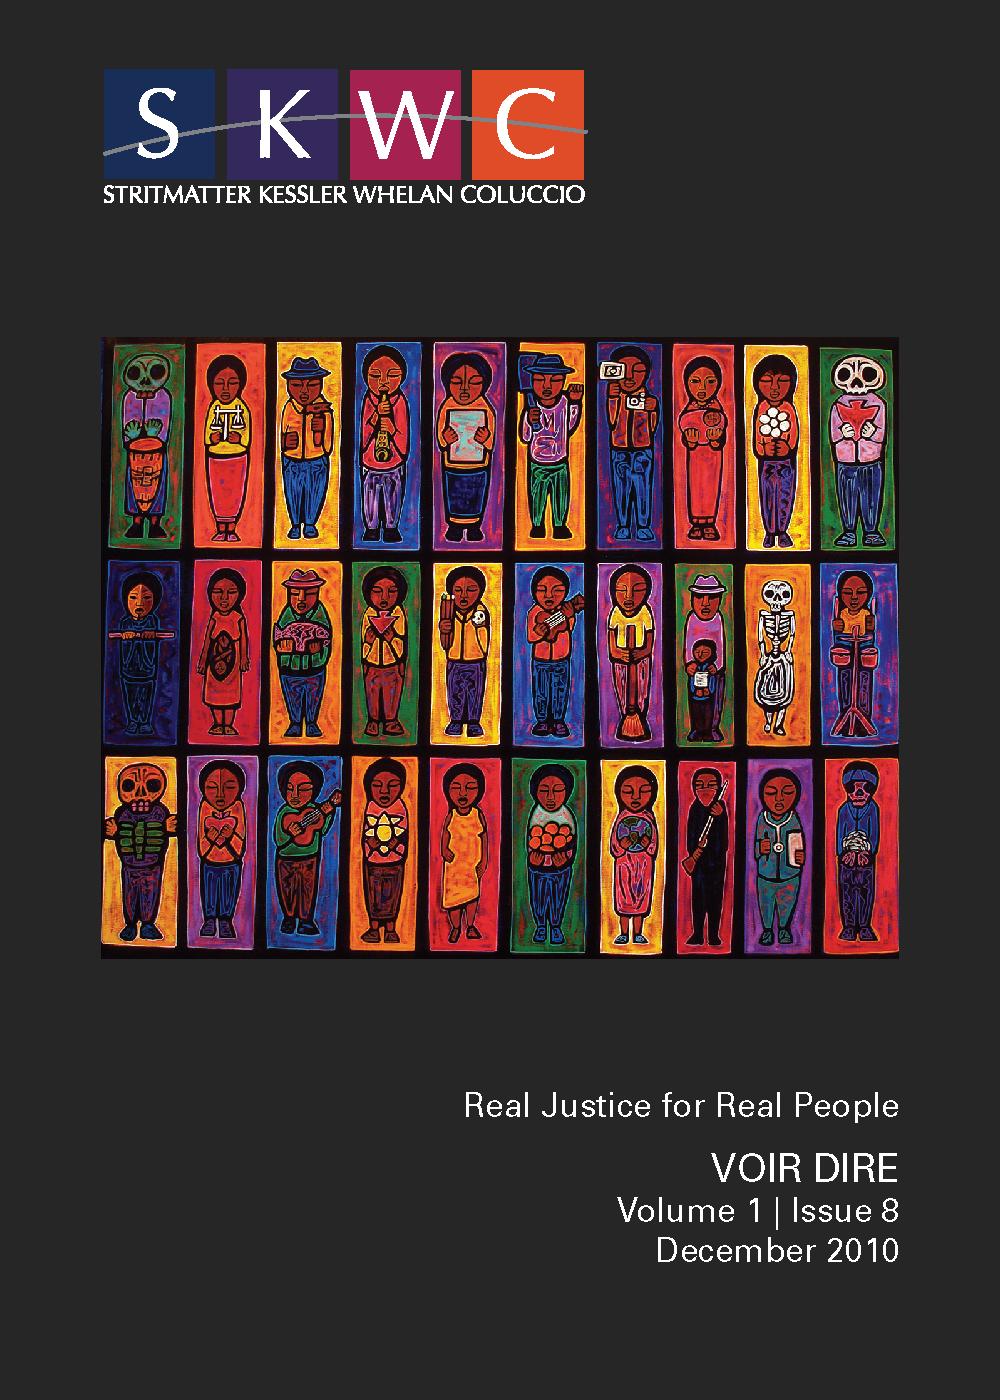 Voir Dire - Published December 2010